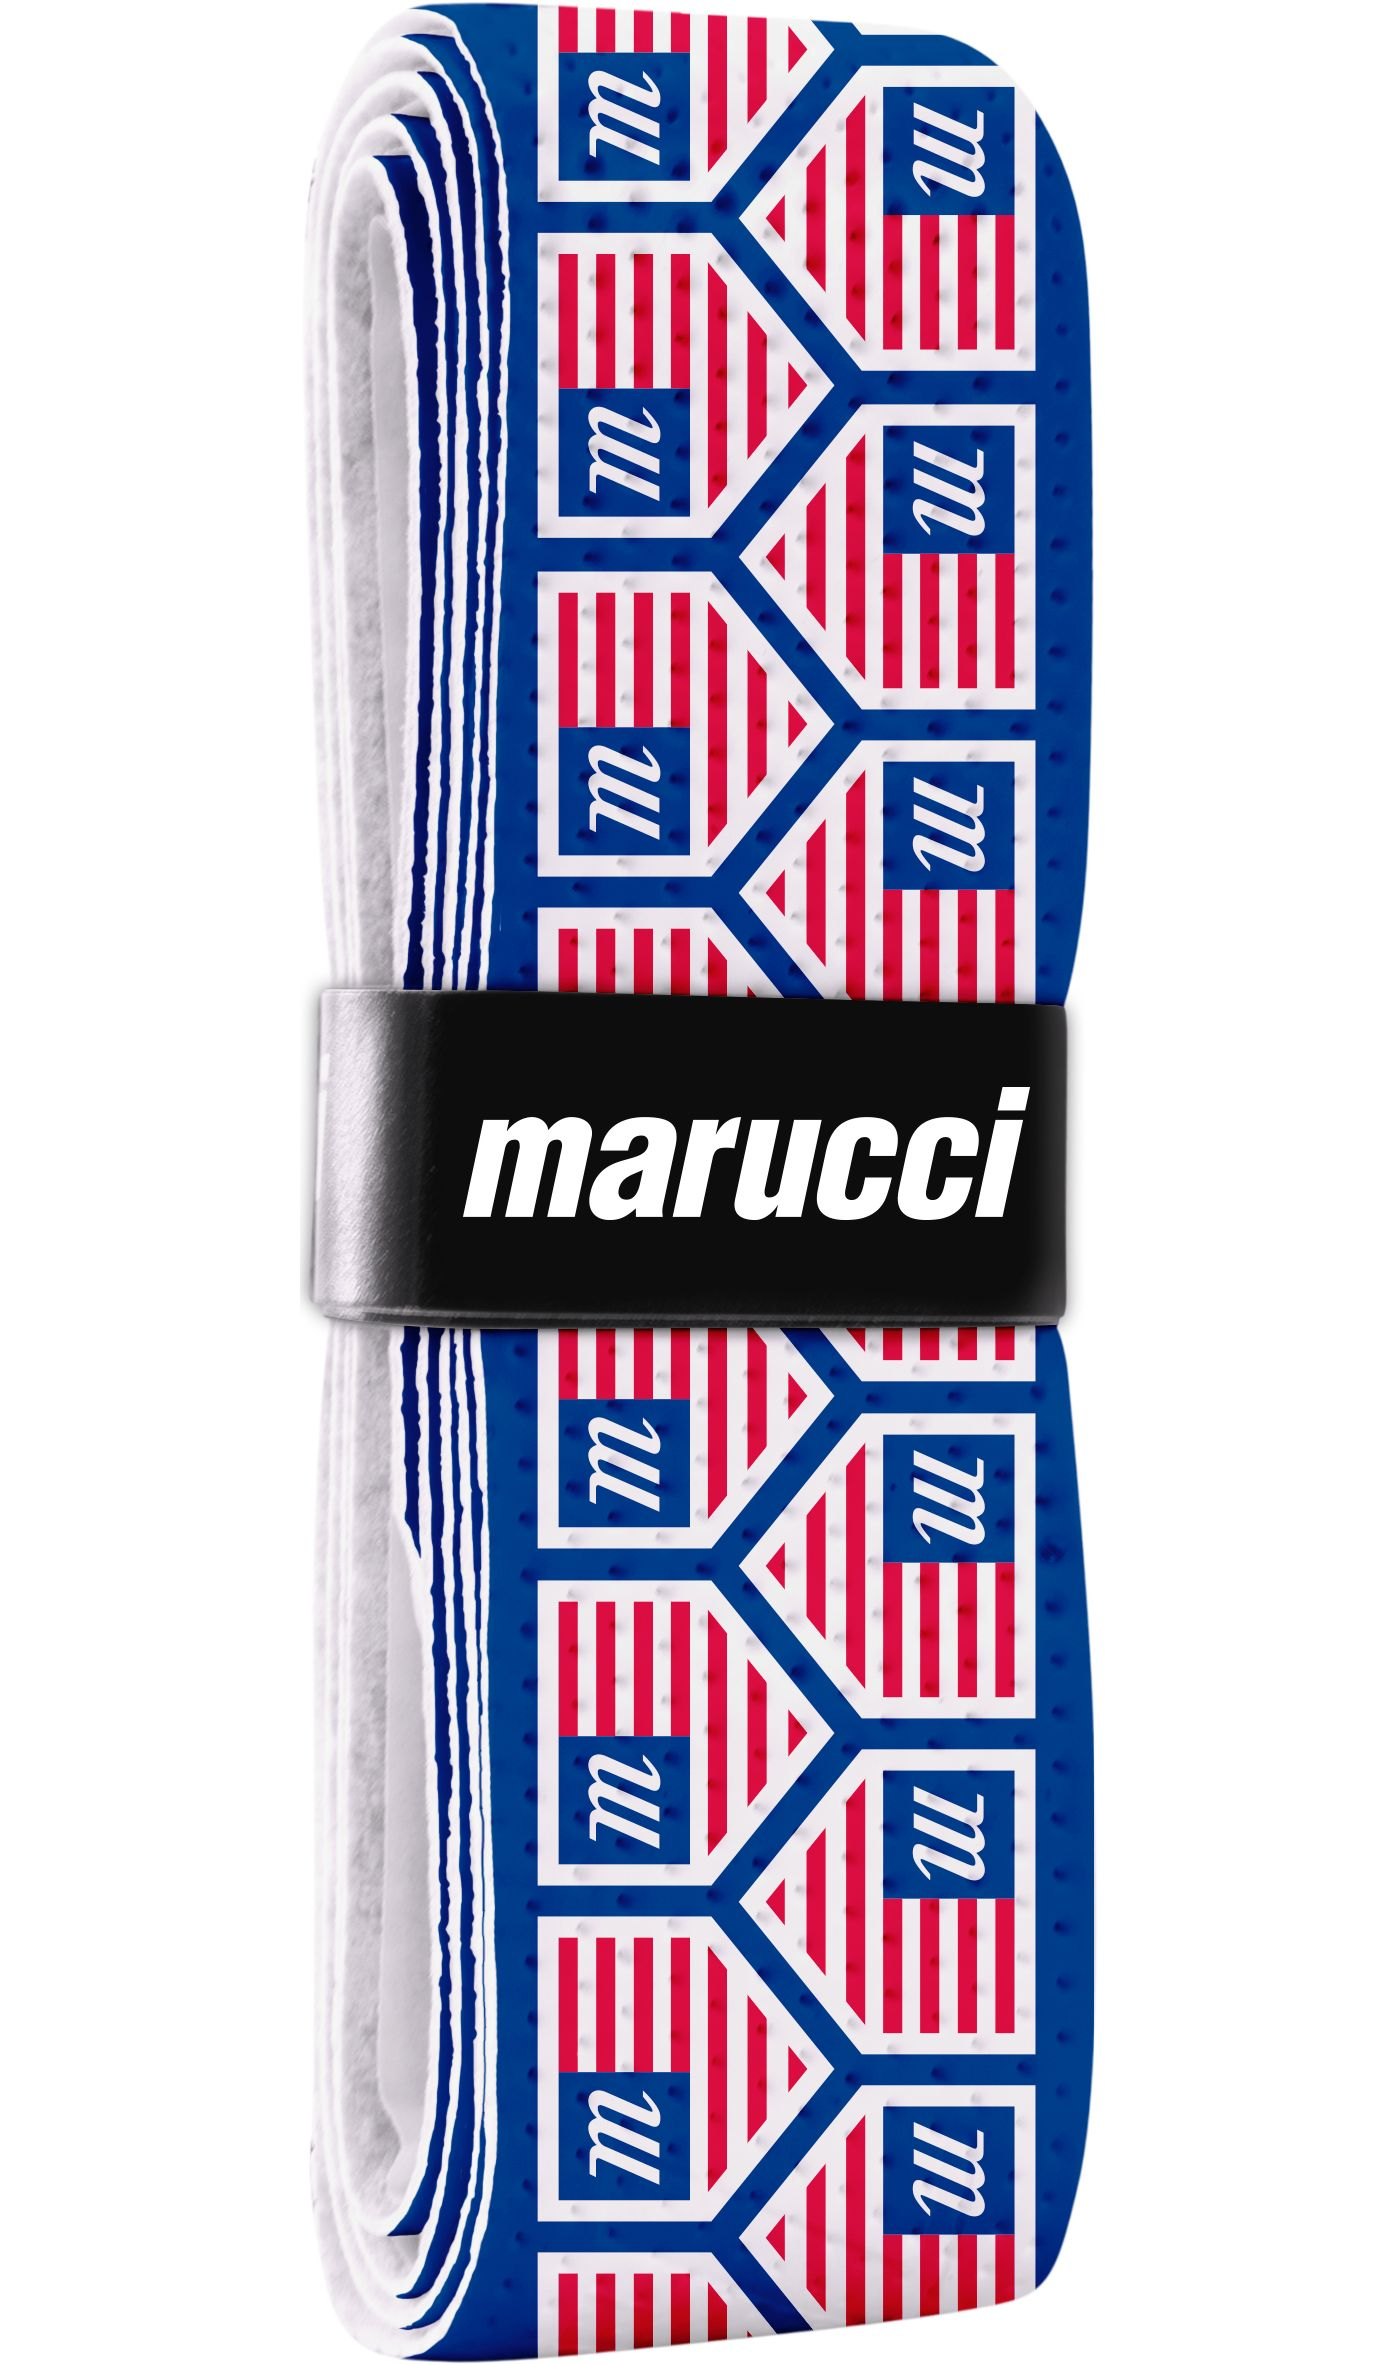 Marucci 1.0mm Bat Grip